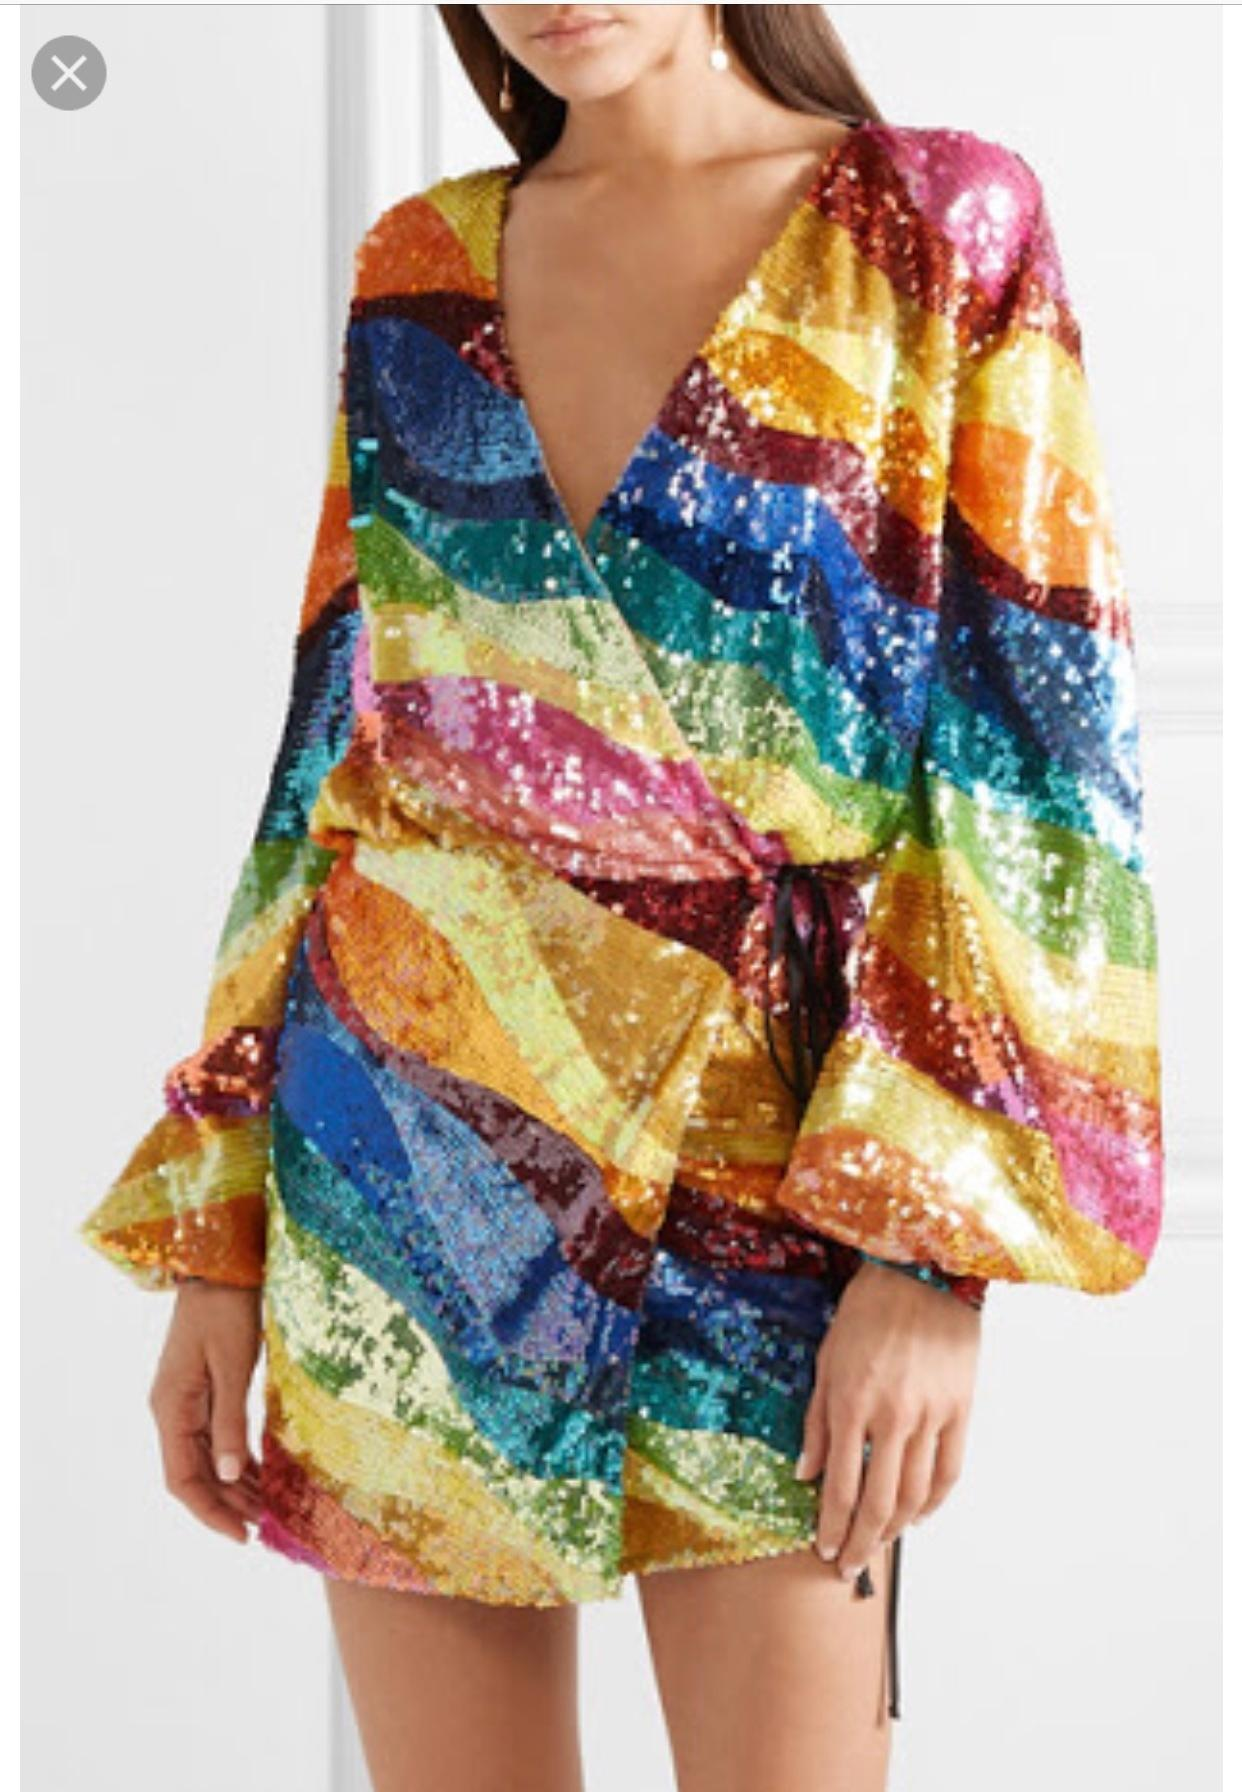 Attico Rainbow Wrap Dress Size 6 The Volte